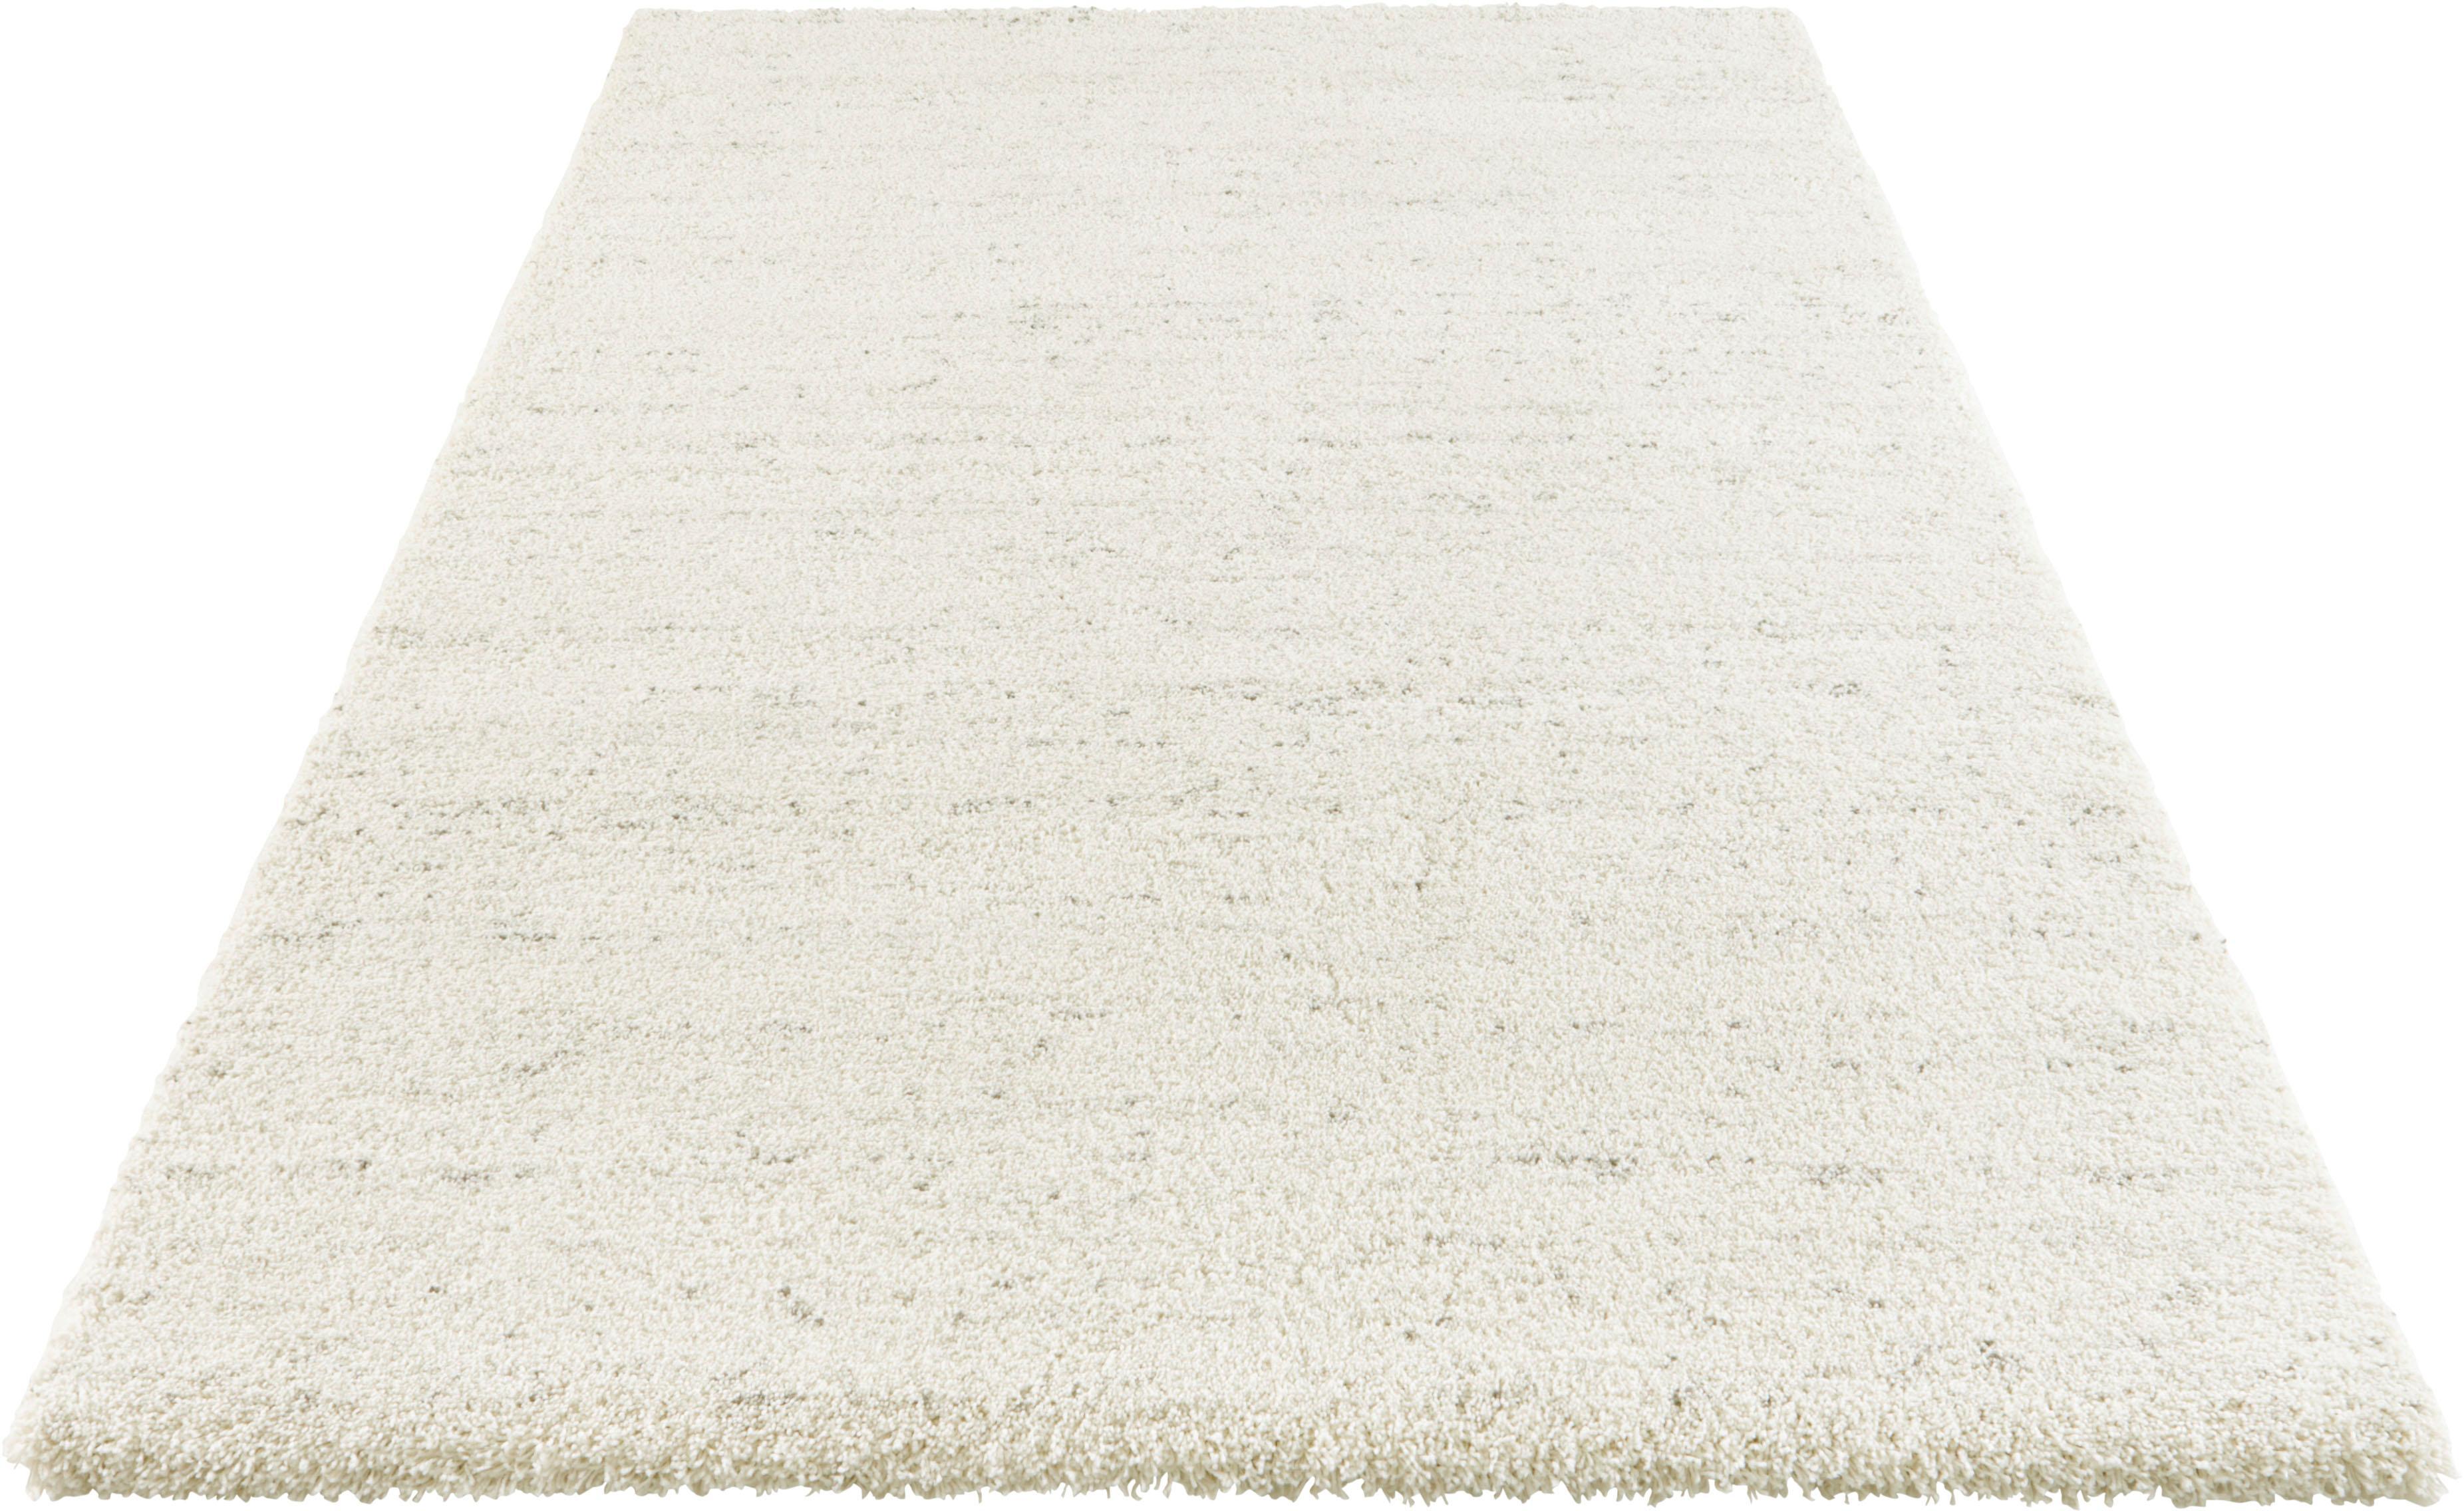 Hochflor-Teppich Orly ELLE Decor rechteckig Höhe 32 mm maschinell gewebt